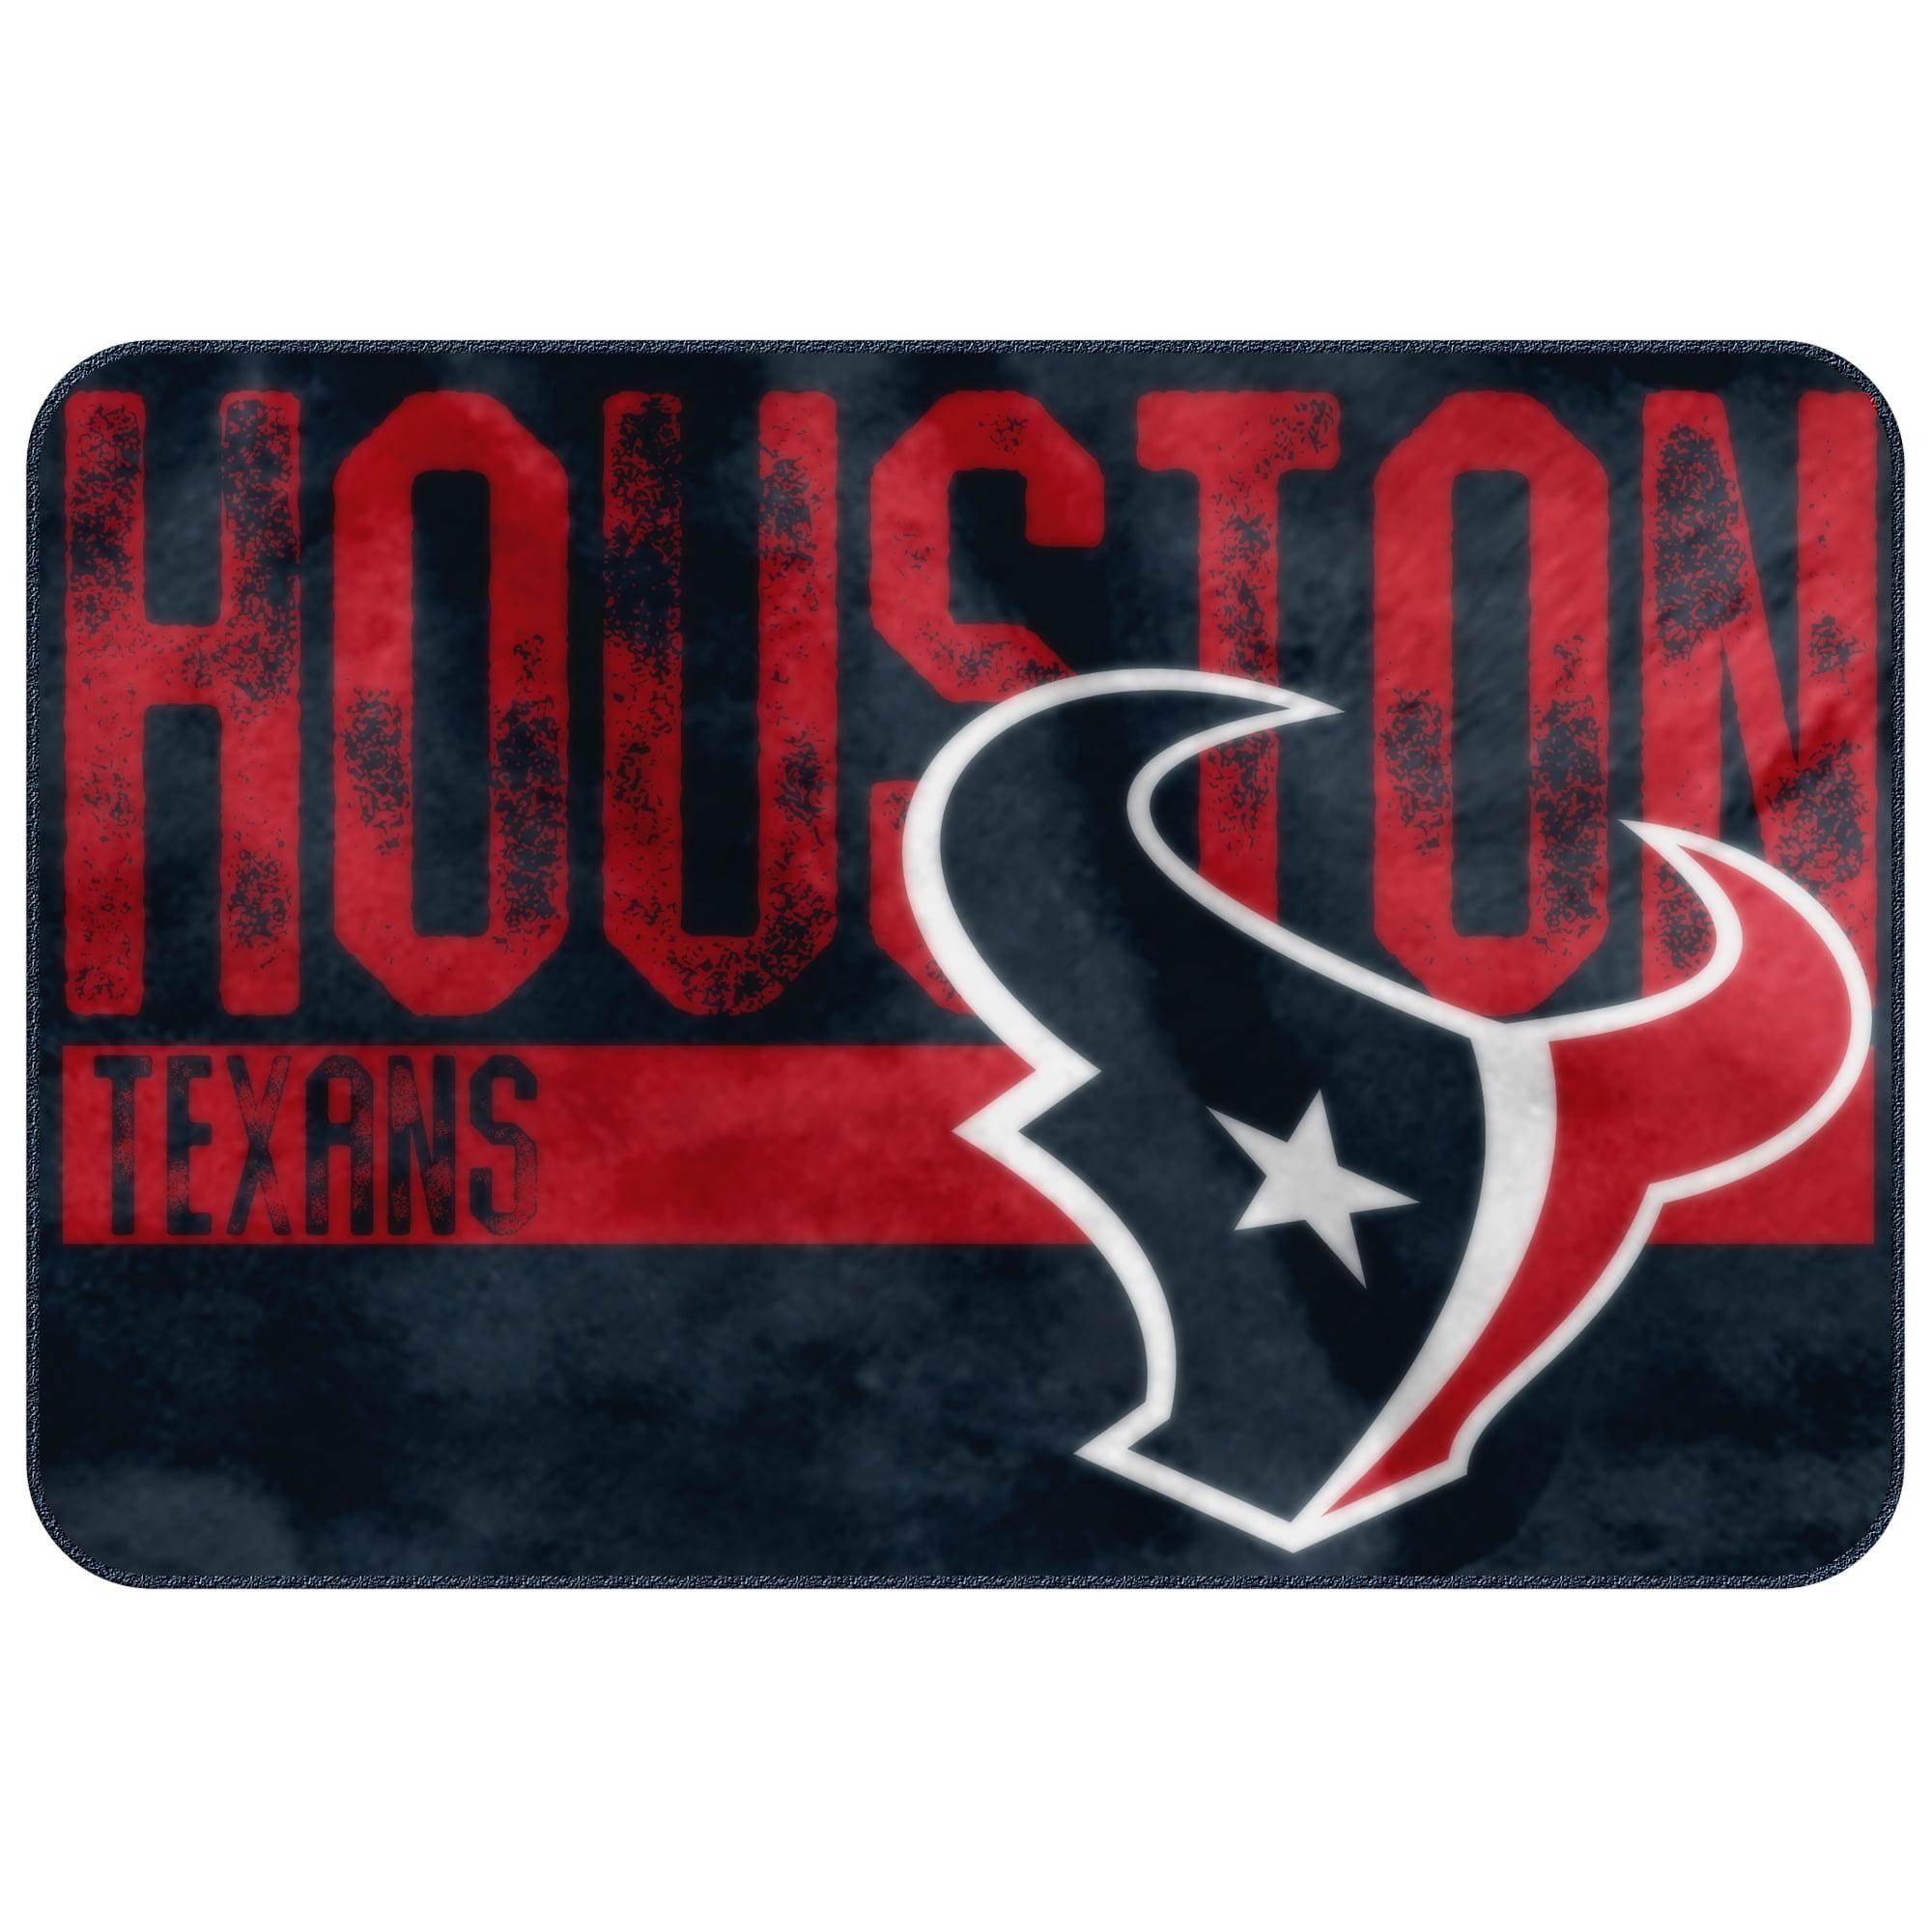 Houston Texans The Northwest Company 20'' x 30'' Wornout Foam Mat - No Size